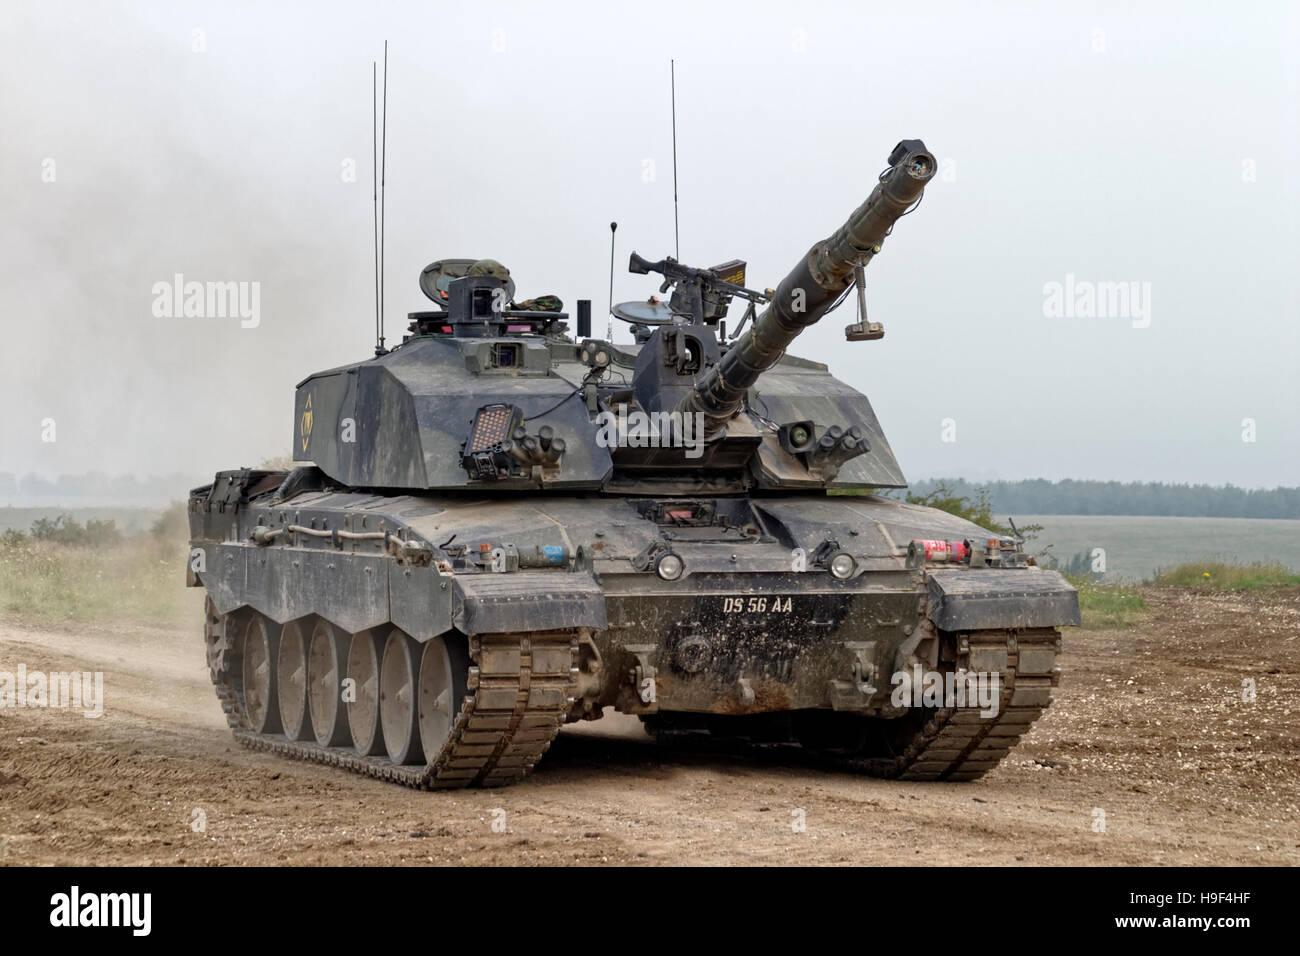 b990f49d8da8 British Army Challenger 2 Main Battle Tank on the Salisbury Plain Military  Training Area in Wiltshire